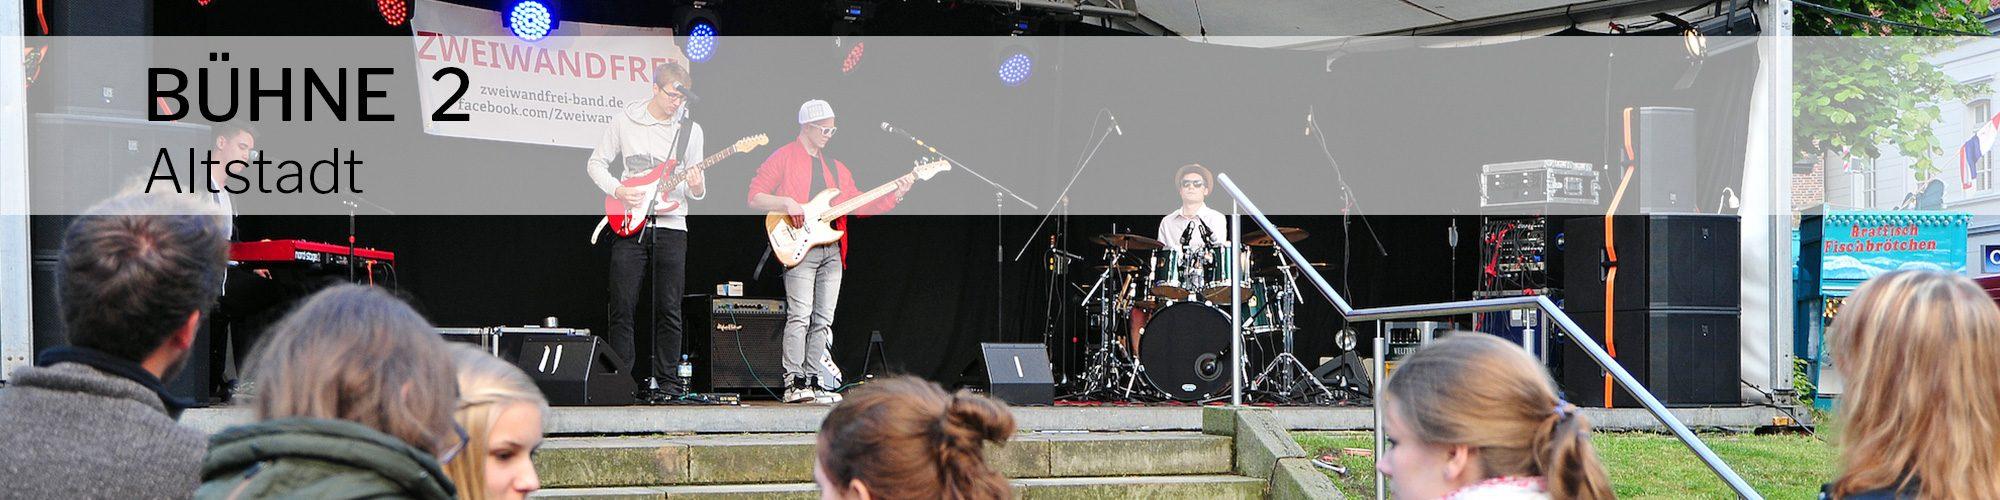 Bühne 2